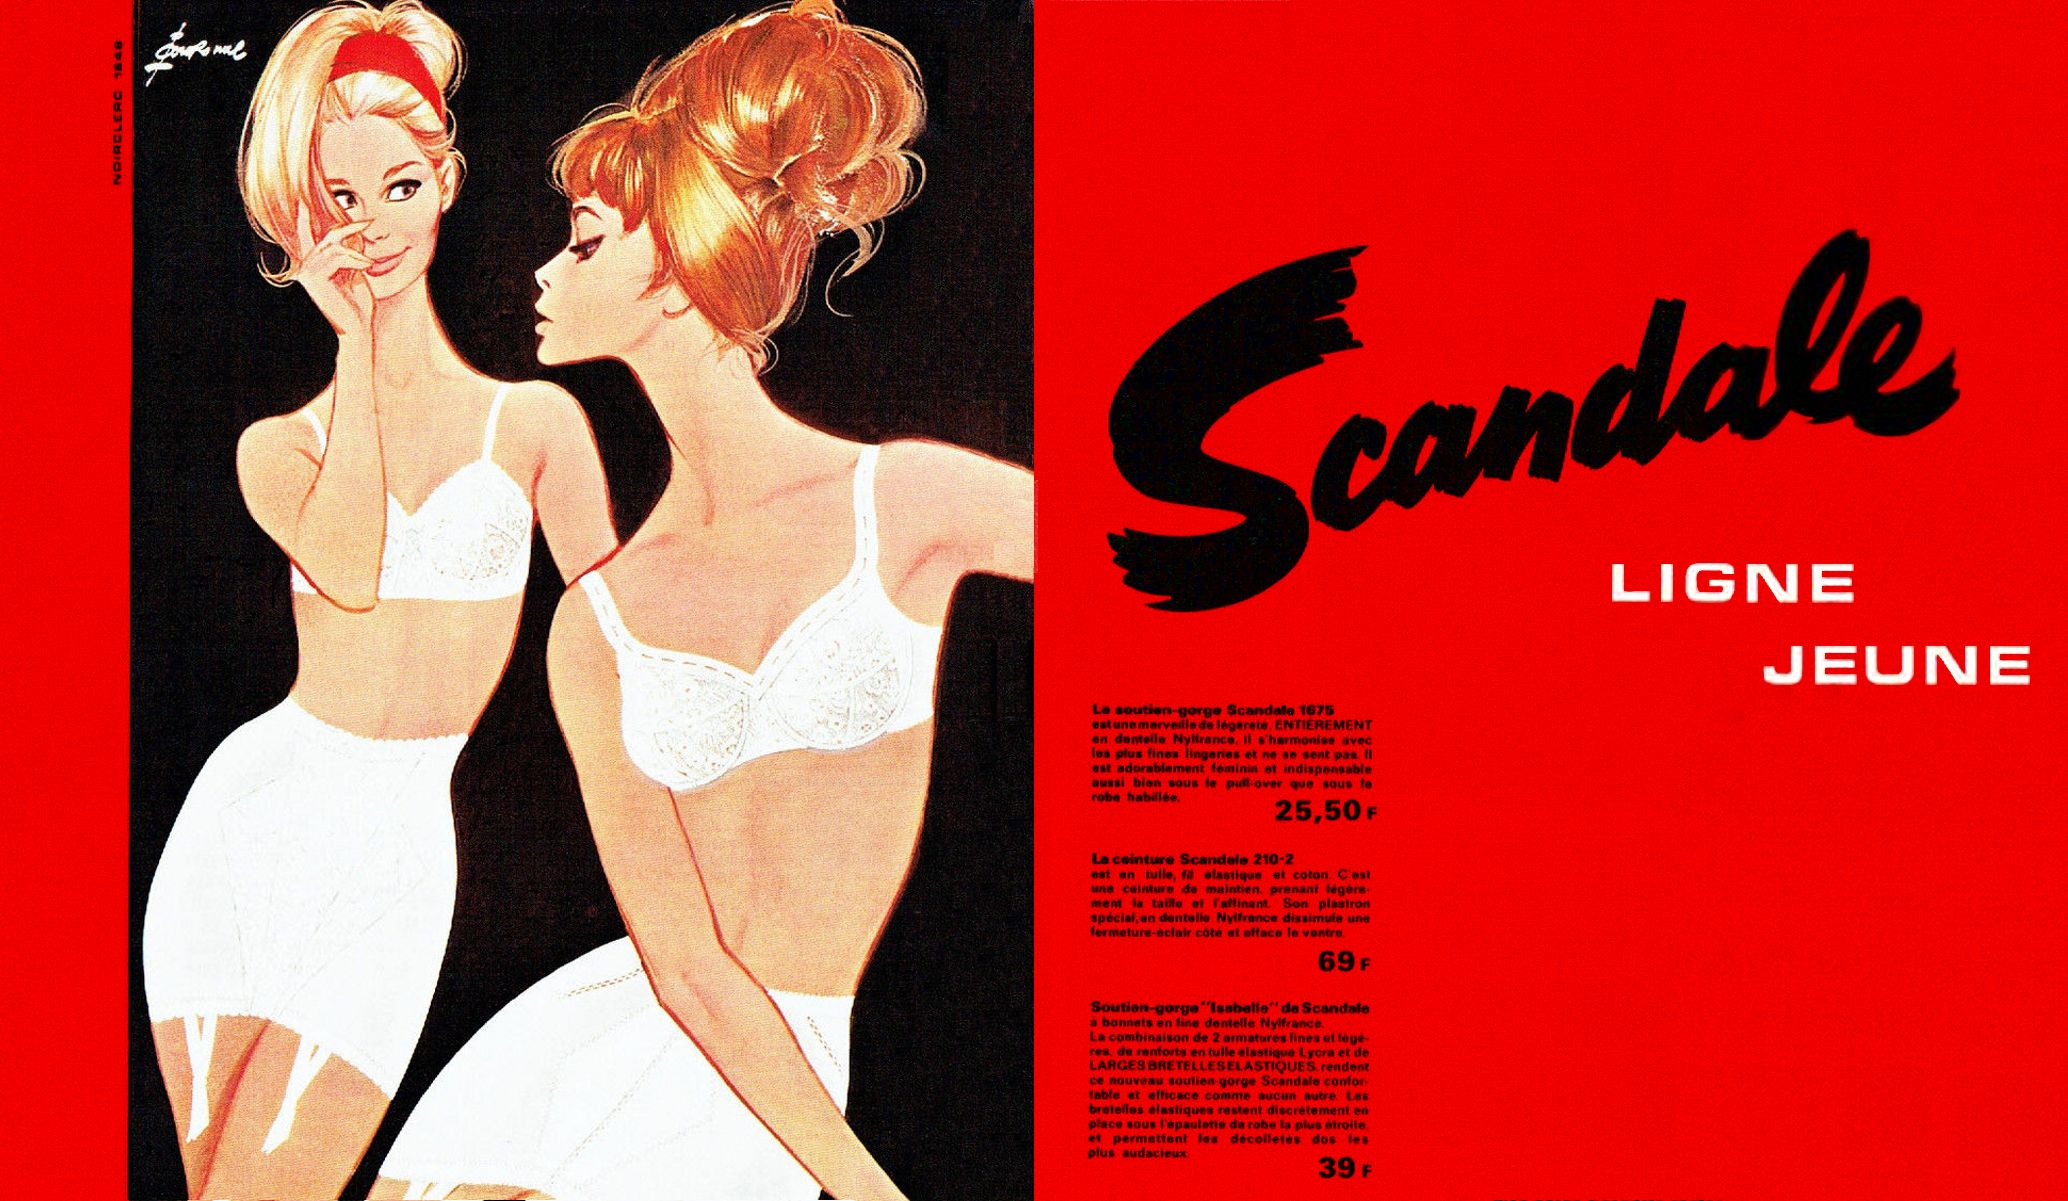 Scandale 1964 Pierre Couronne A1